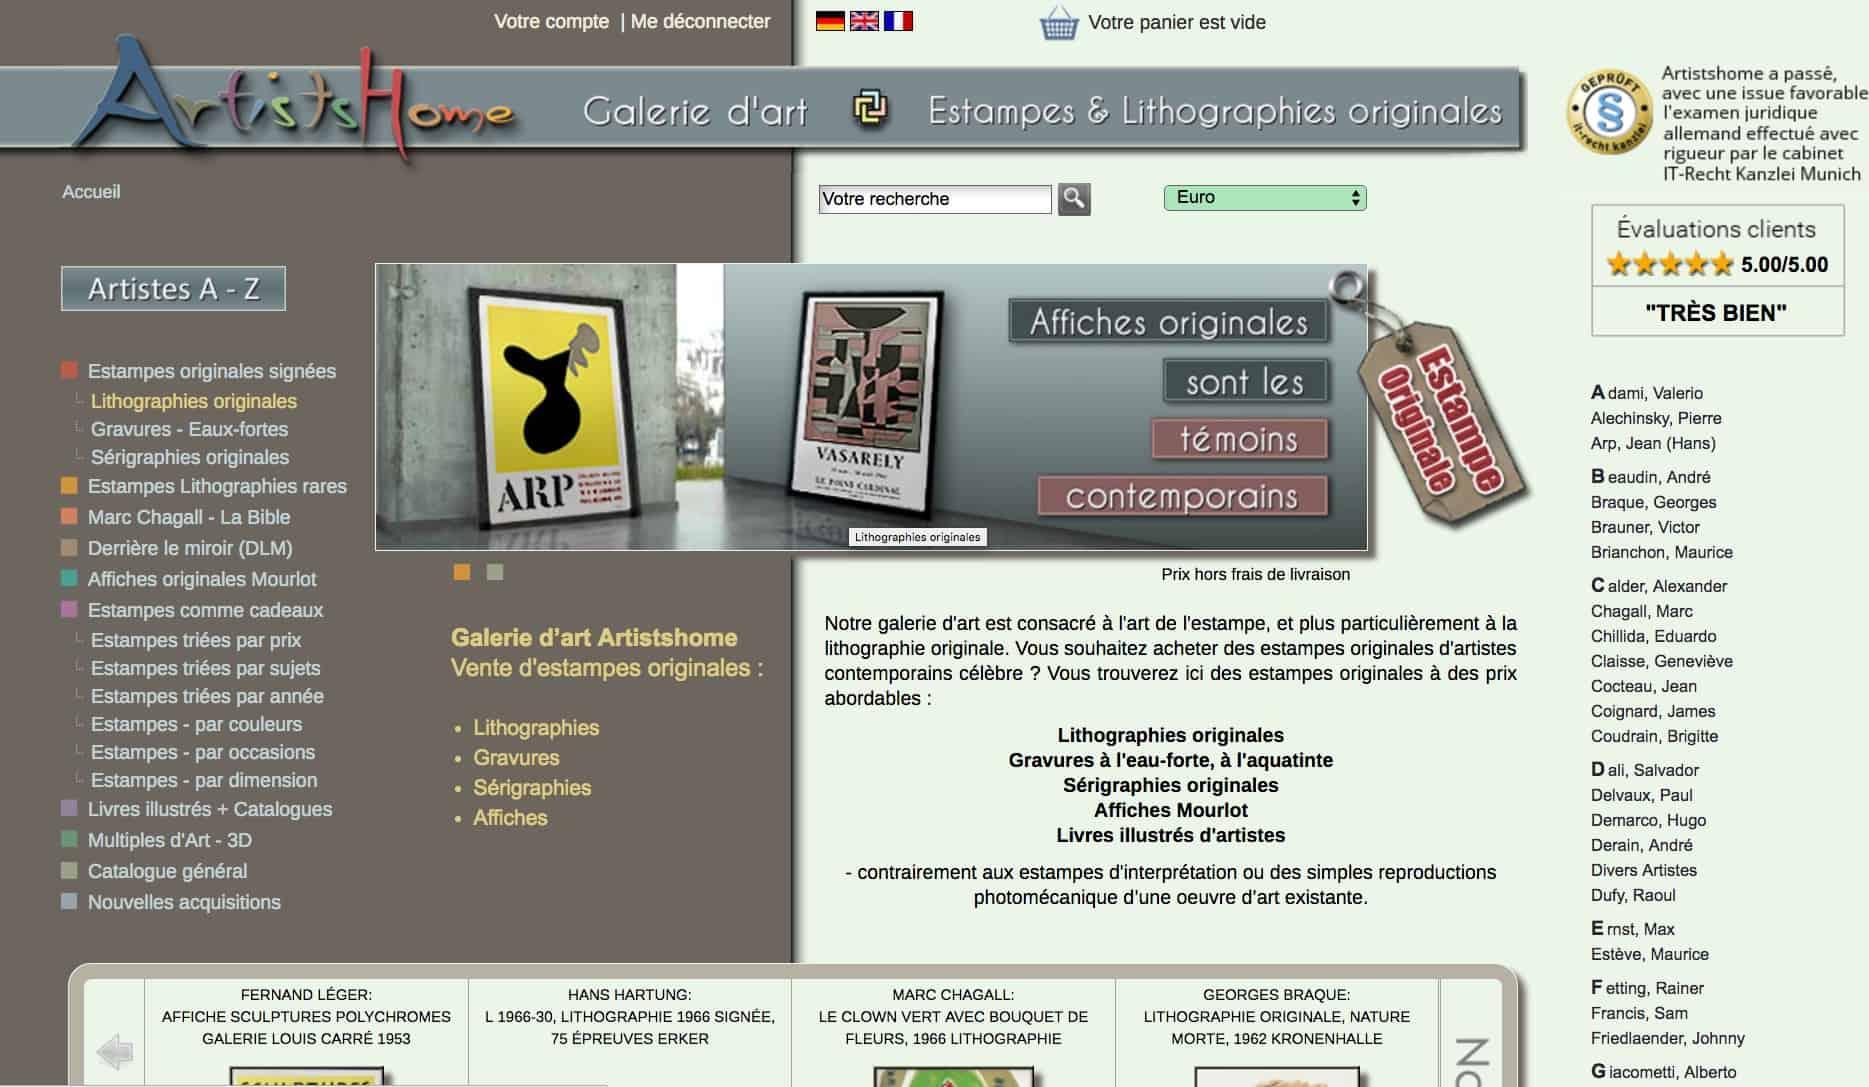 estampes modernes, lithographies